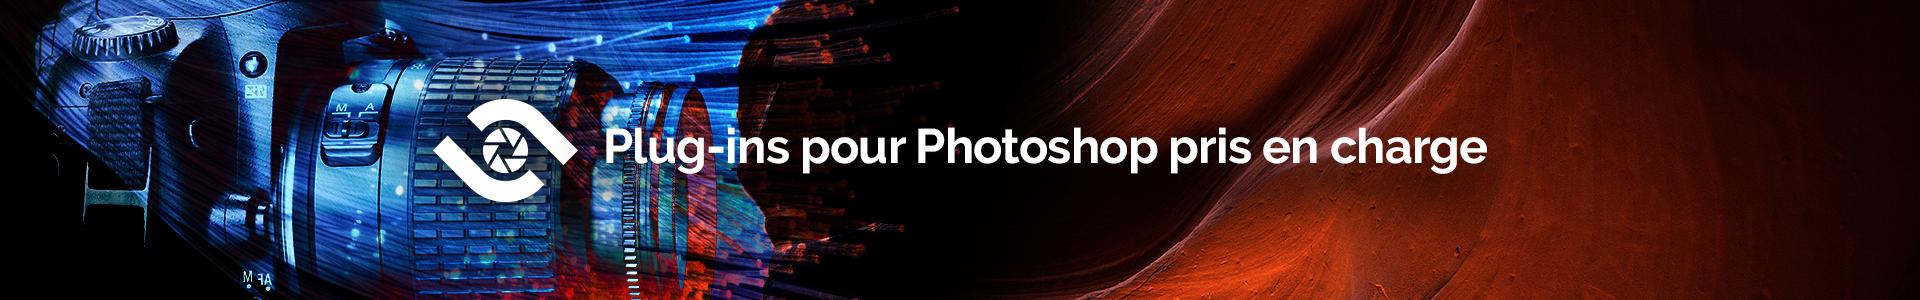 Photoshop Plugins Banner EN